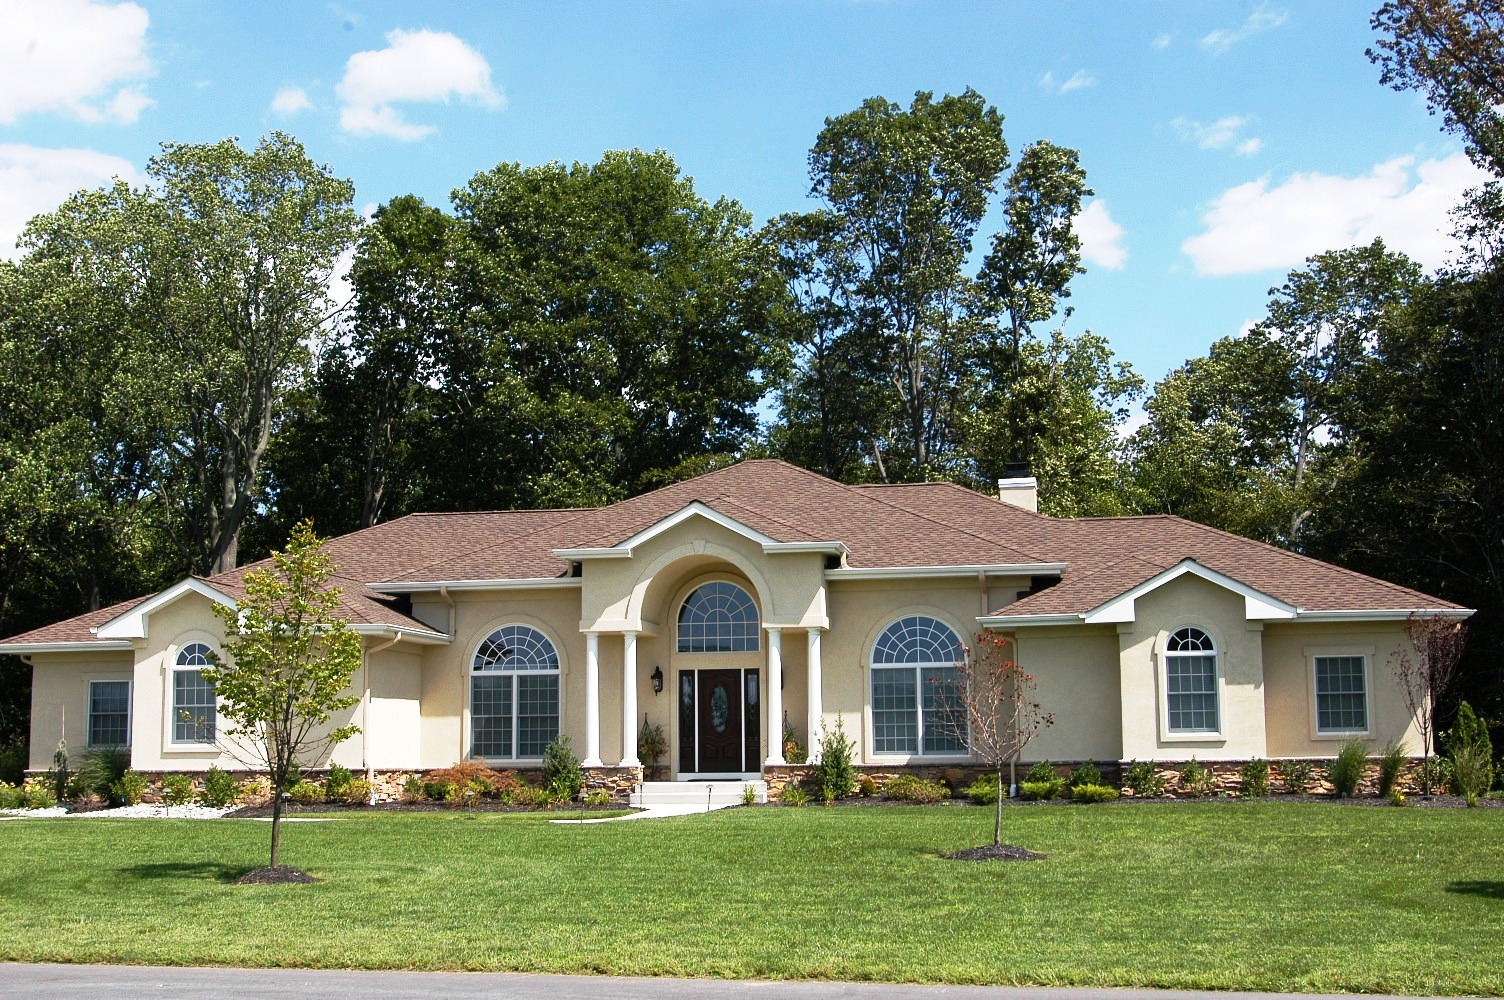 Myers Creek Residence